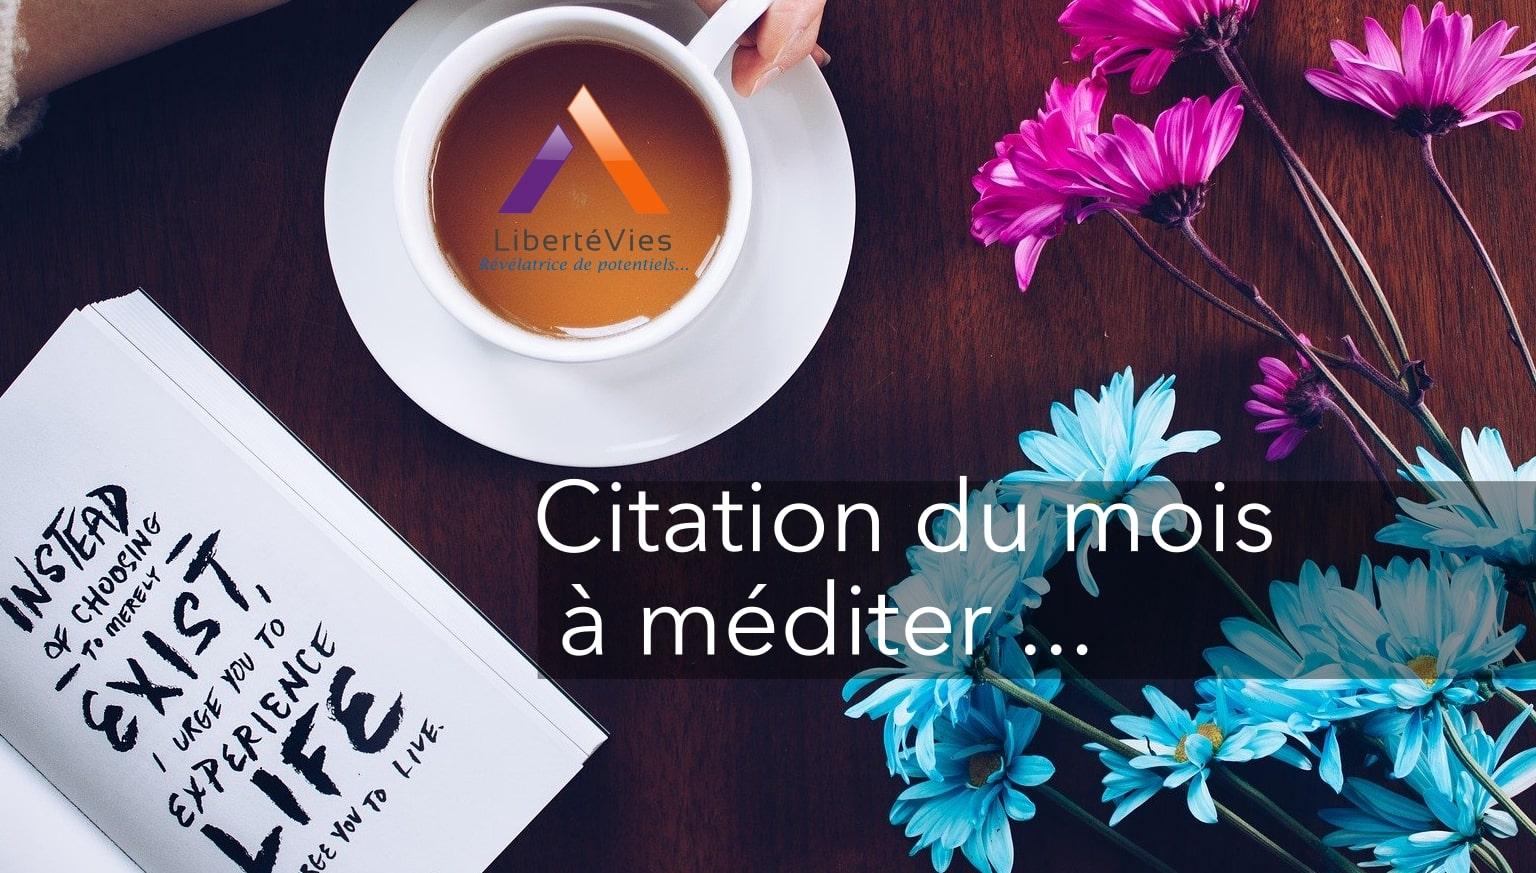 Citation Septembre 2020